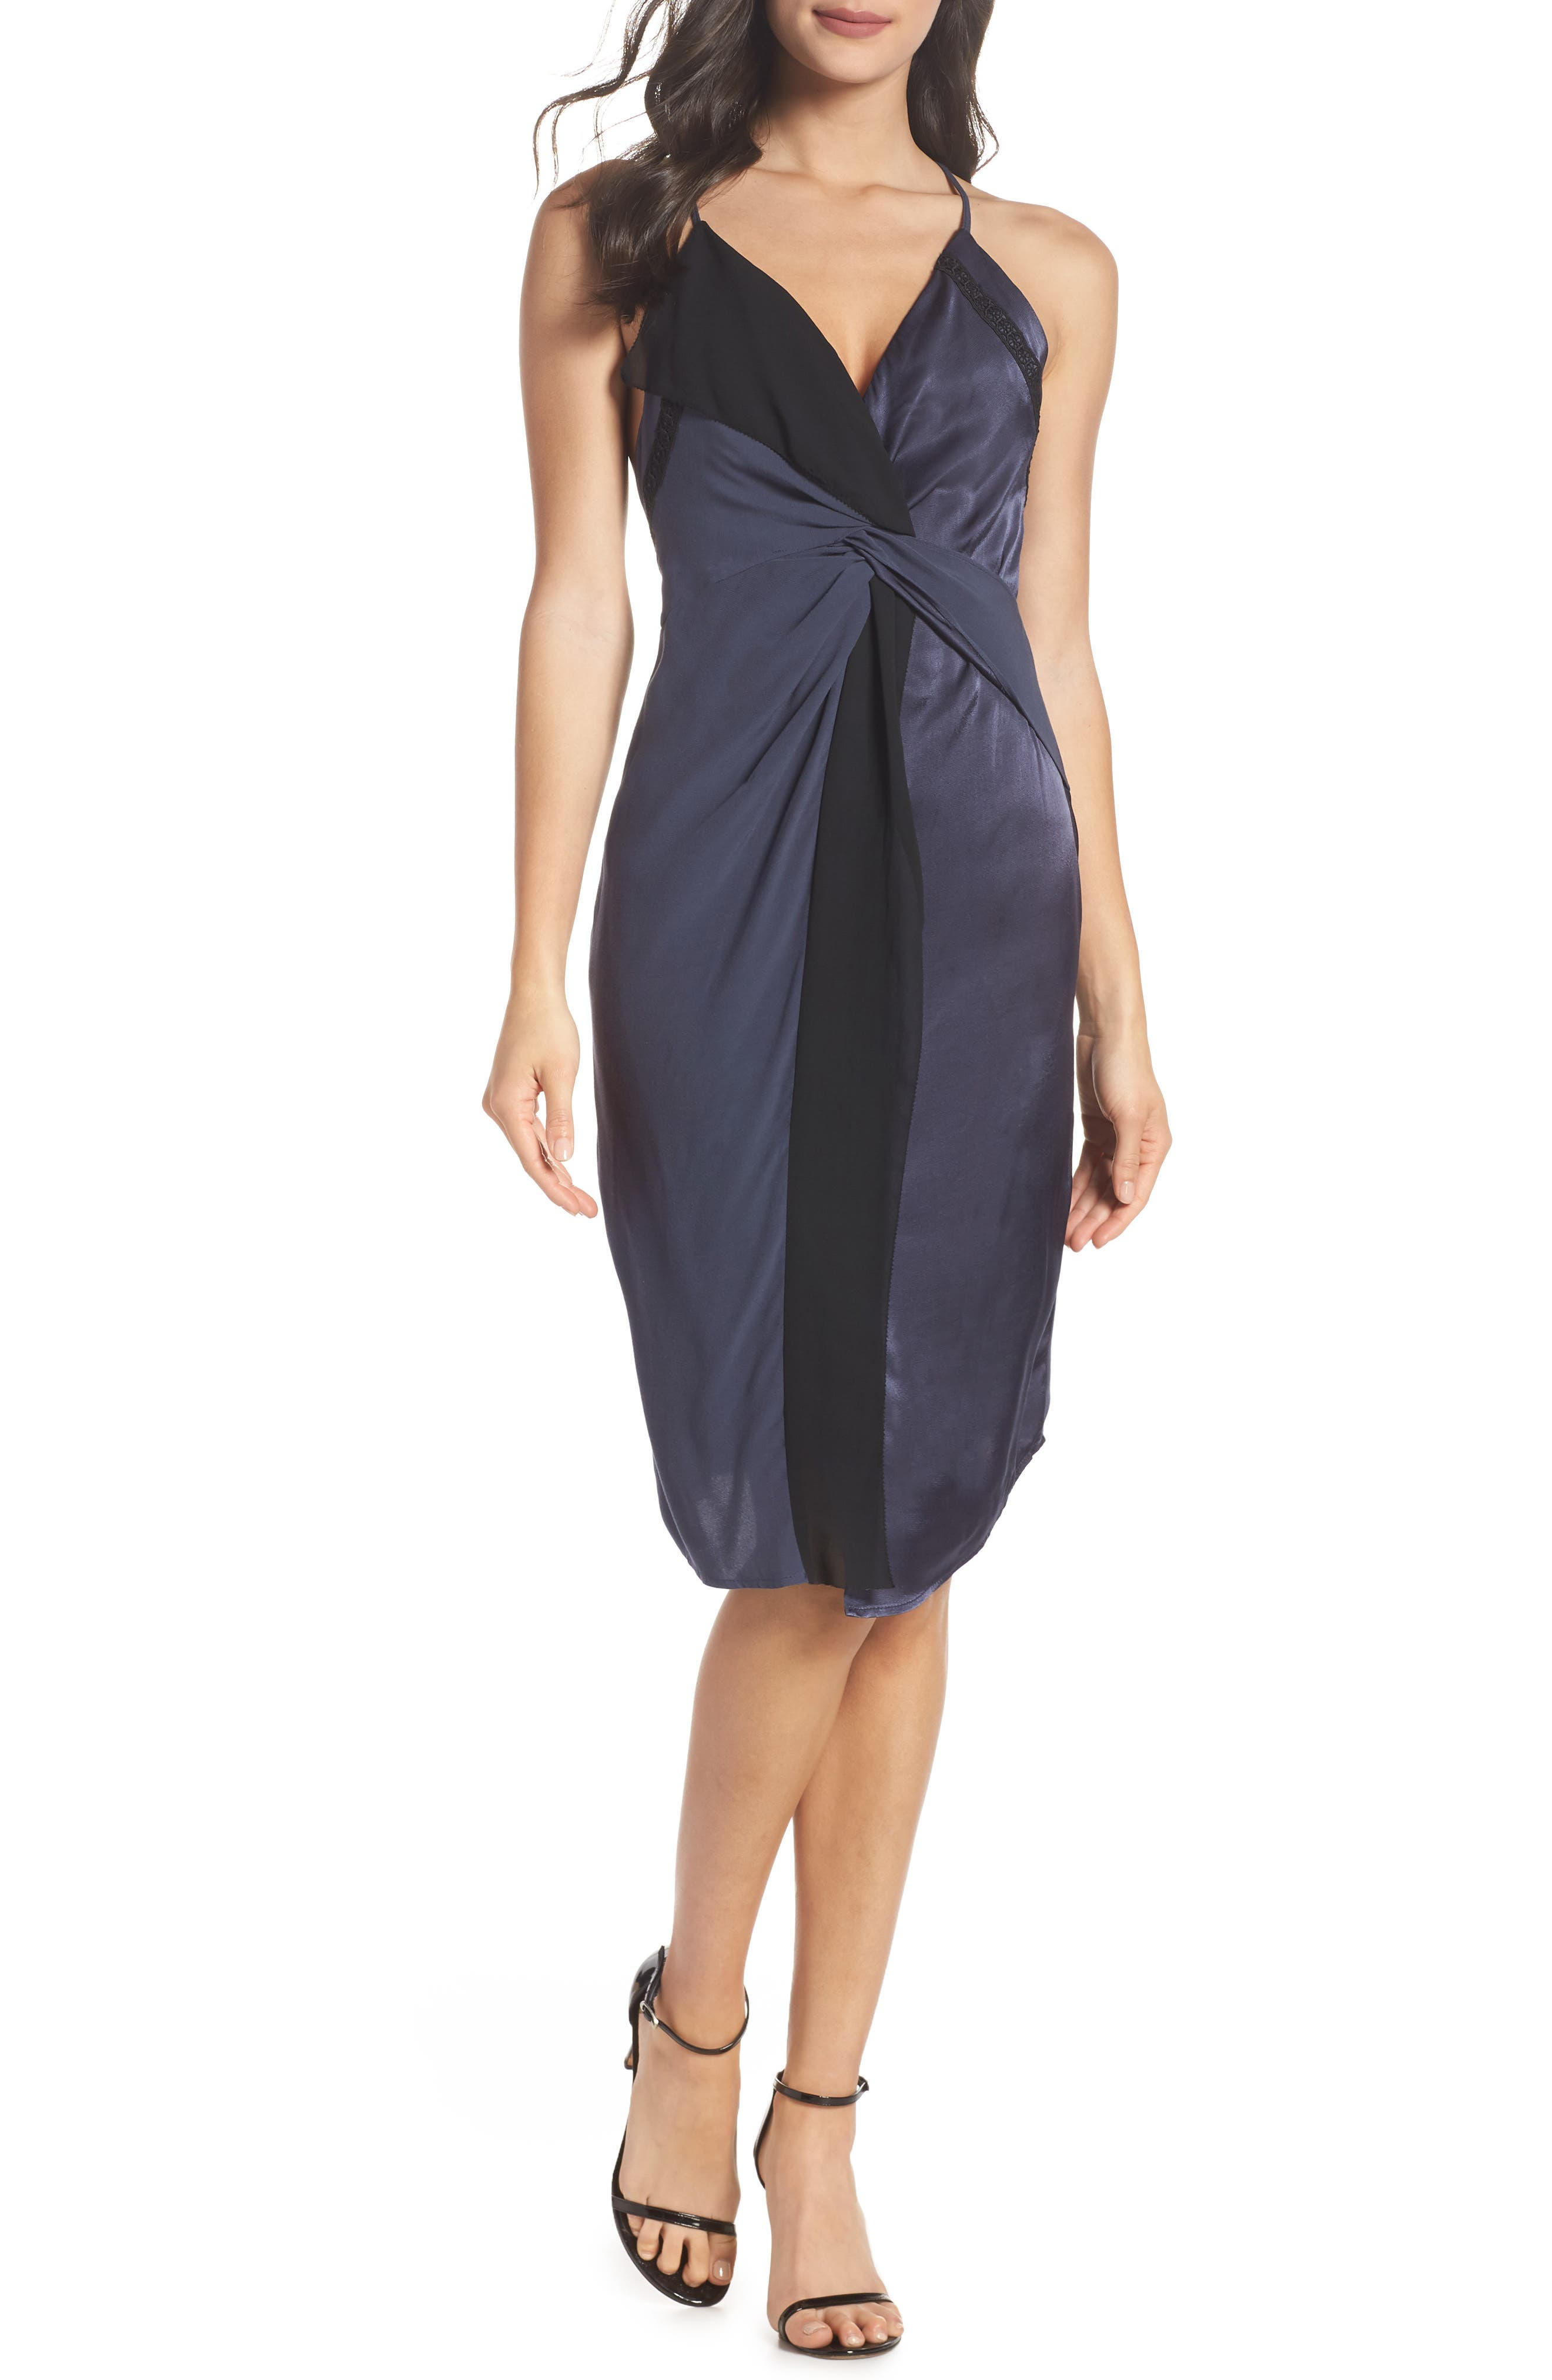 Twist Front Cocktail Dress,                             Main thumbnail 1, color,                             BLACK/ NAVY